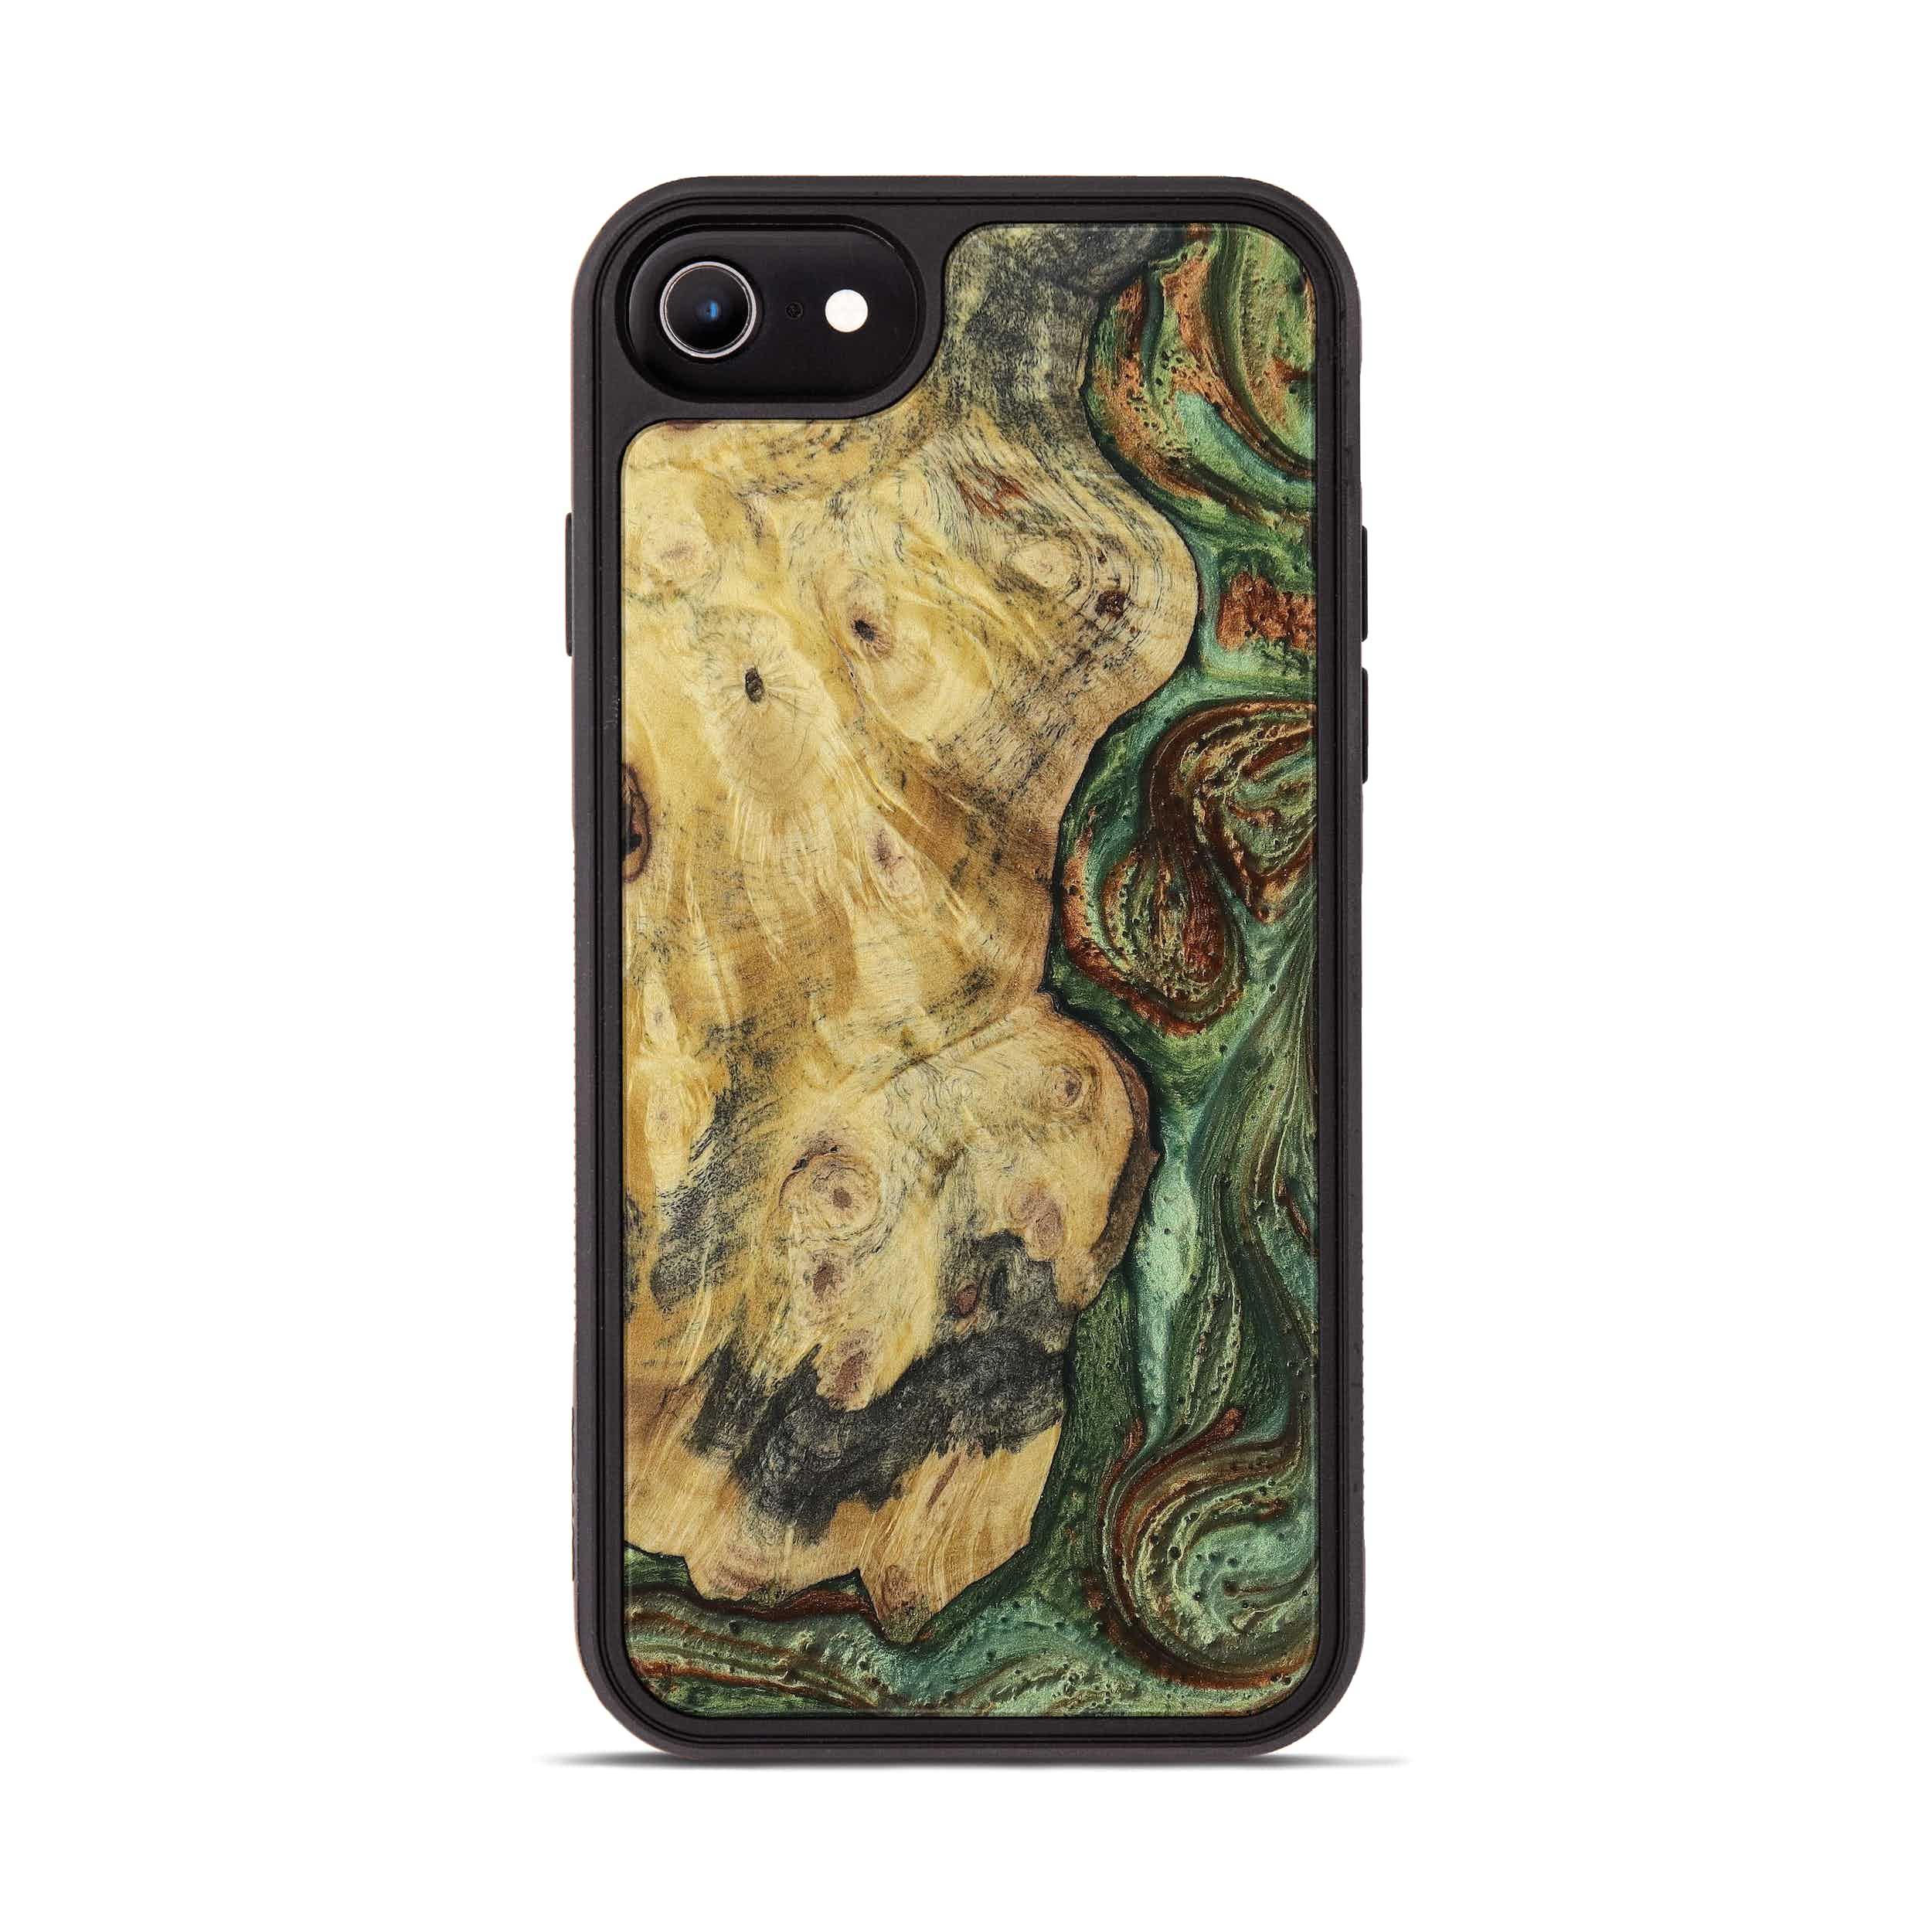 iPhone 6s Wood+Resin Phone Case - Tamqrah (Dark Green, 397859)